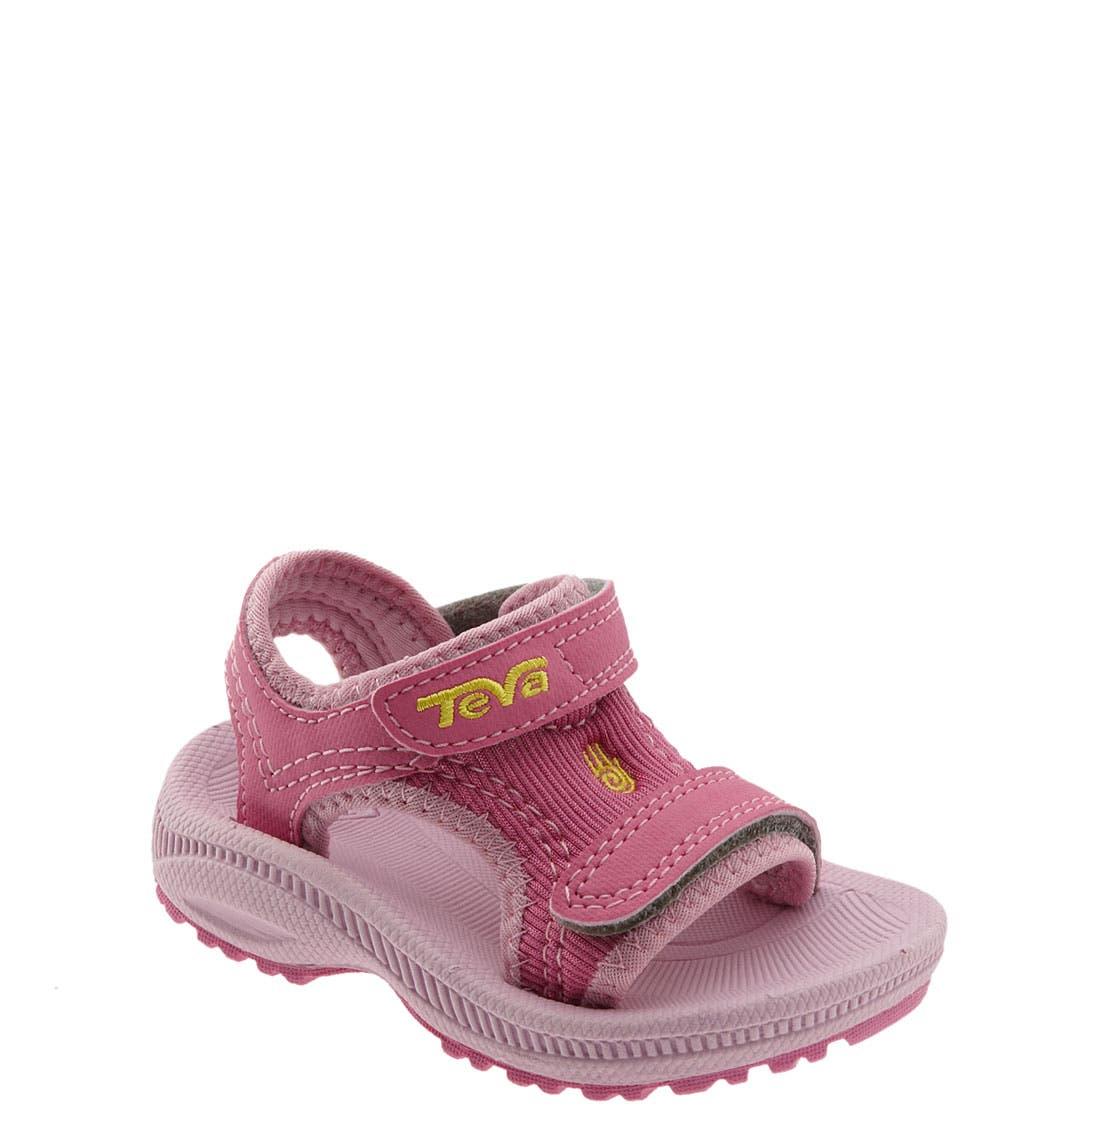 Main Image - Teva 'I Psyclone' Athletic Sandal (Baby, Walker & Toddler)